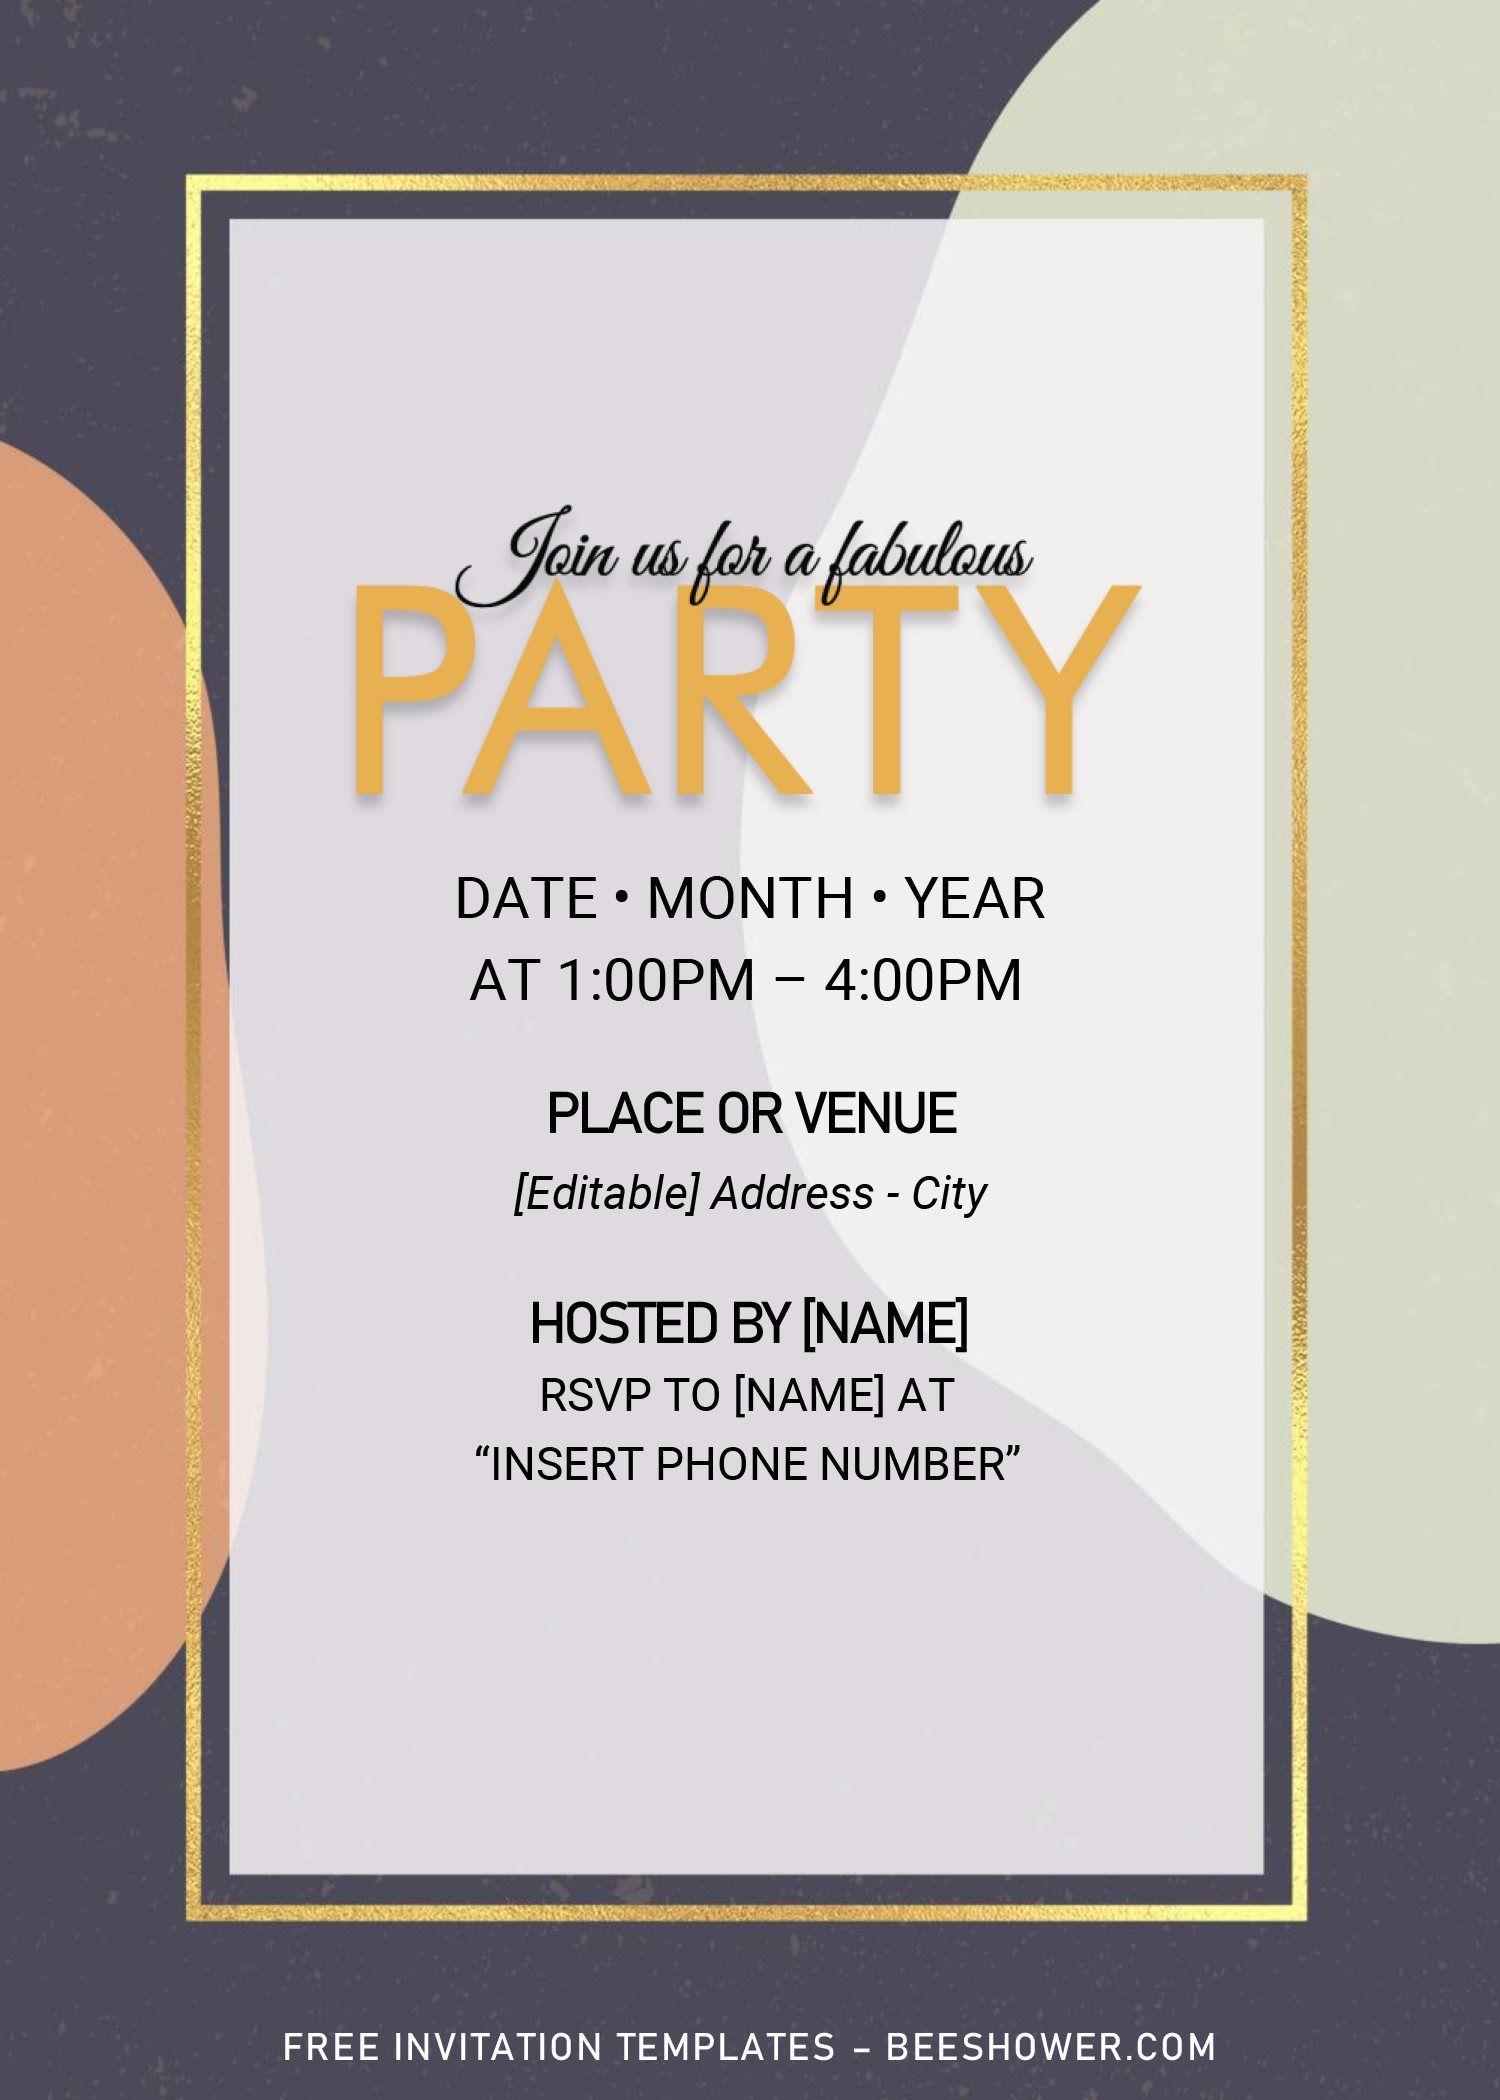 Memphis Birthday Invitation Templates Editable With Microsoft Word Free Printable Baby Shower Invitations Birthday Invitation Templates Invitation Template